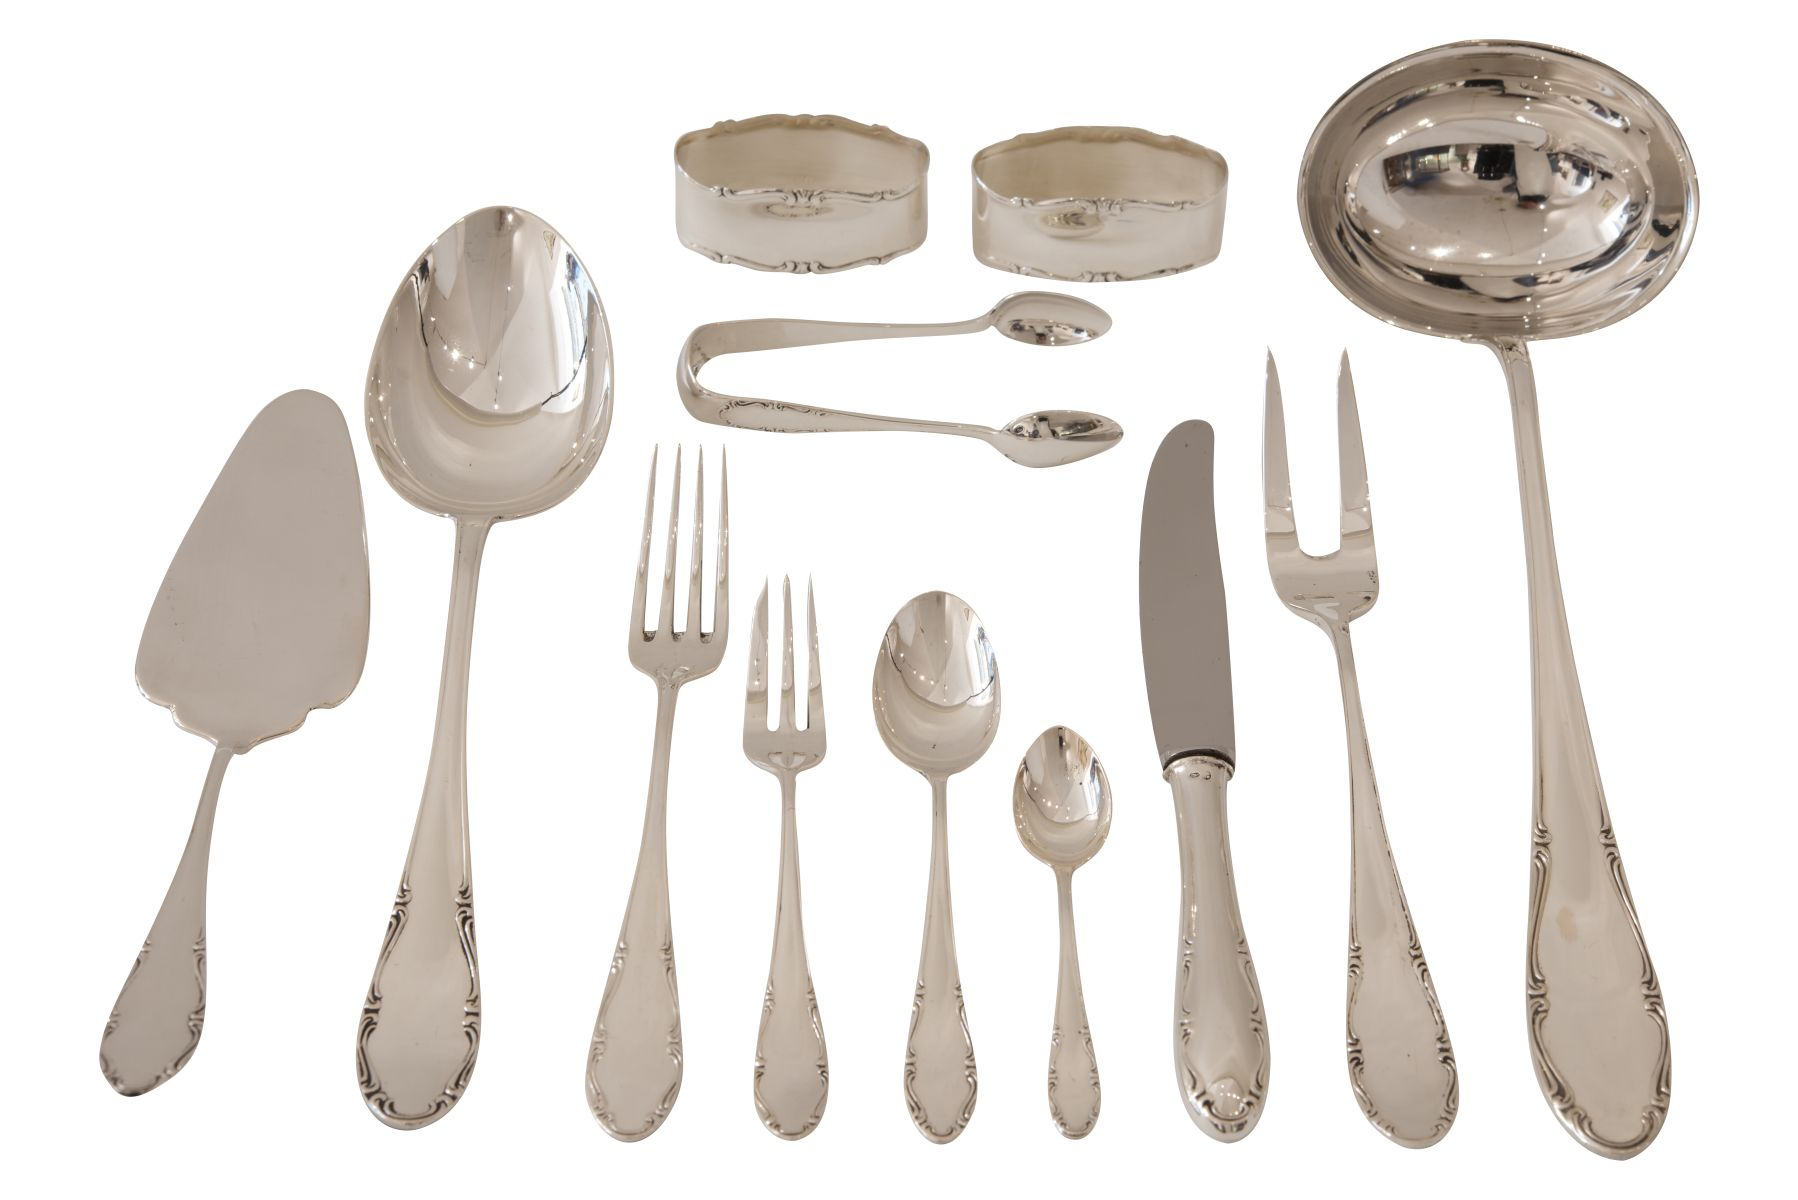 #73 Cutlery Set | Besteck Konvolut A. Sturm Wien Image